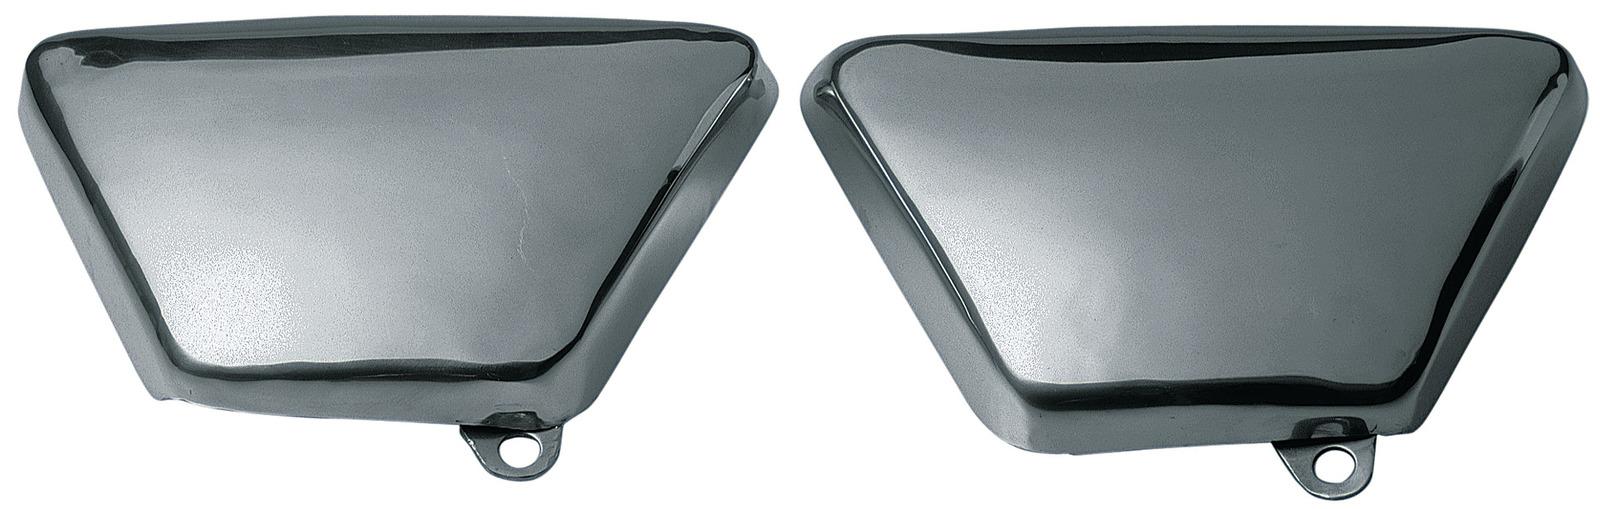 yamaha sr500 aluminium seitendeckel set rechts links. Black Bedroom Furniture Sets. Home Design Ideas